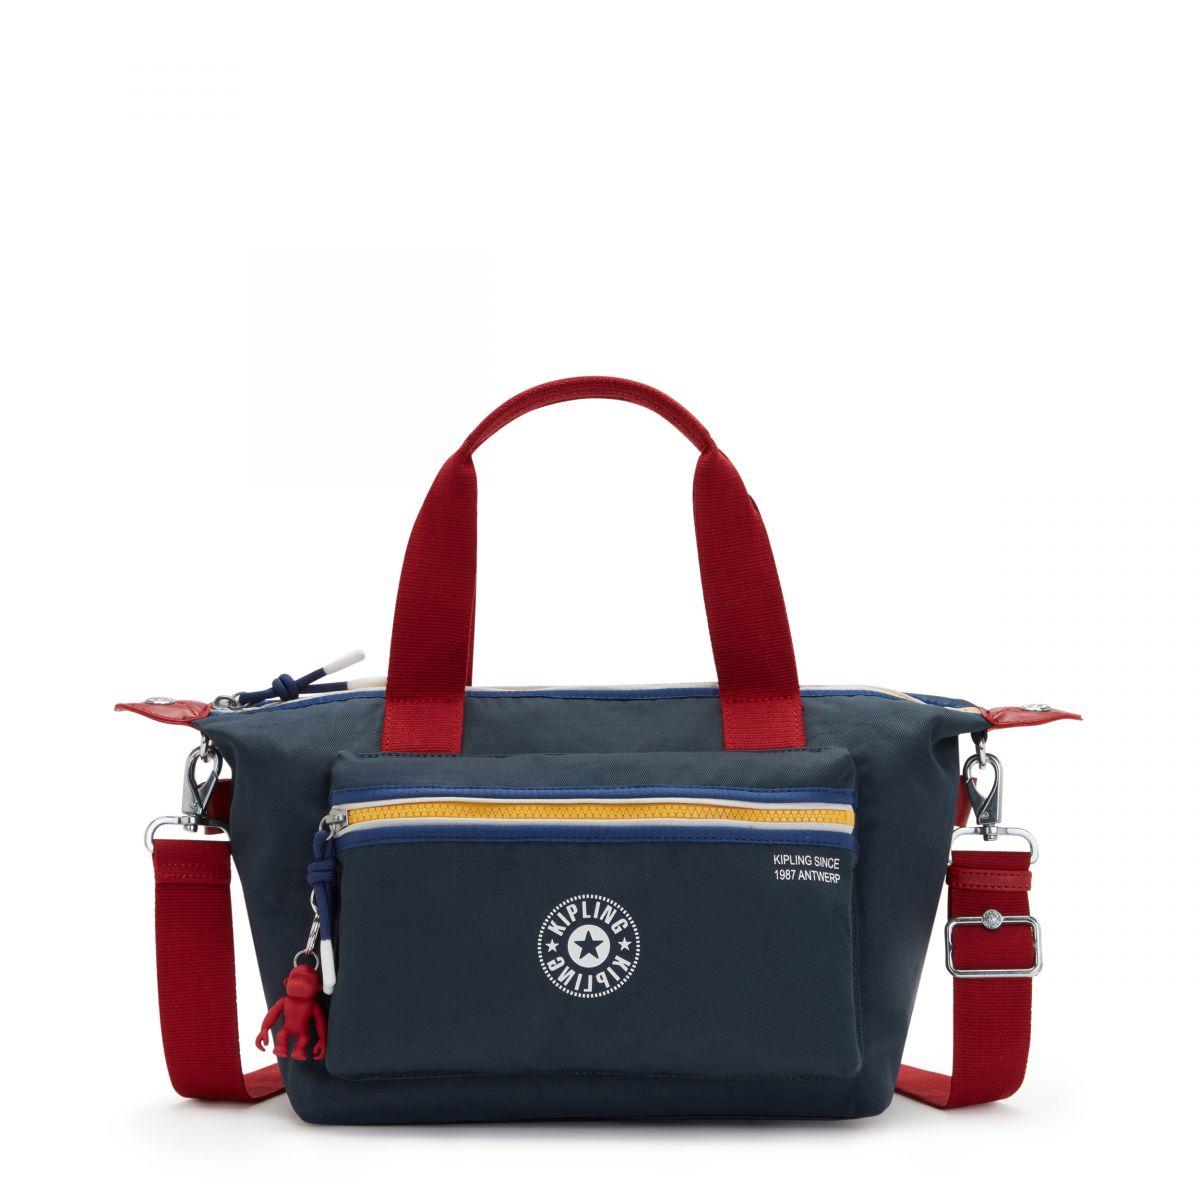 ART MINI P BAGS by Kipling - Front view